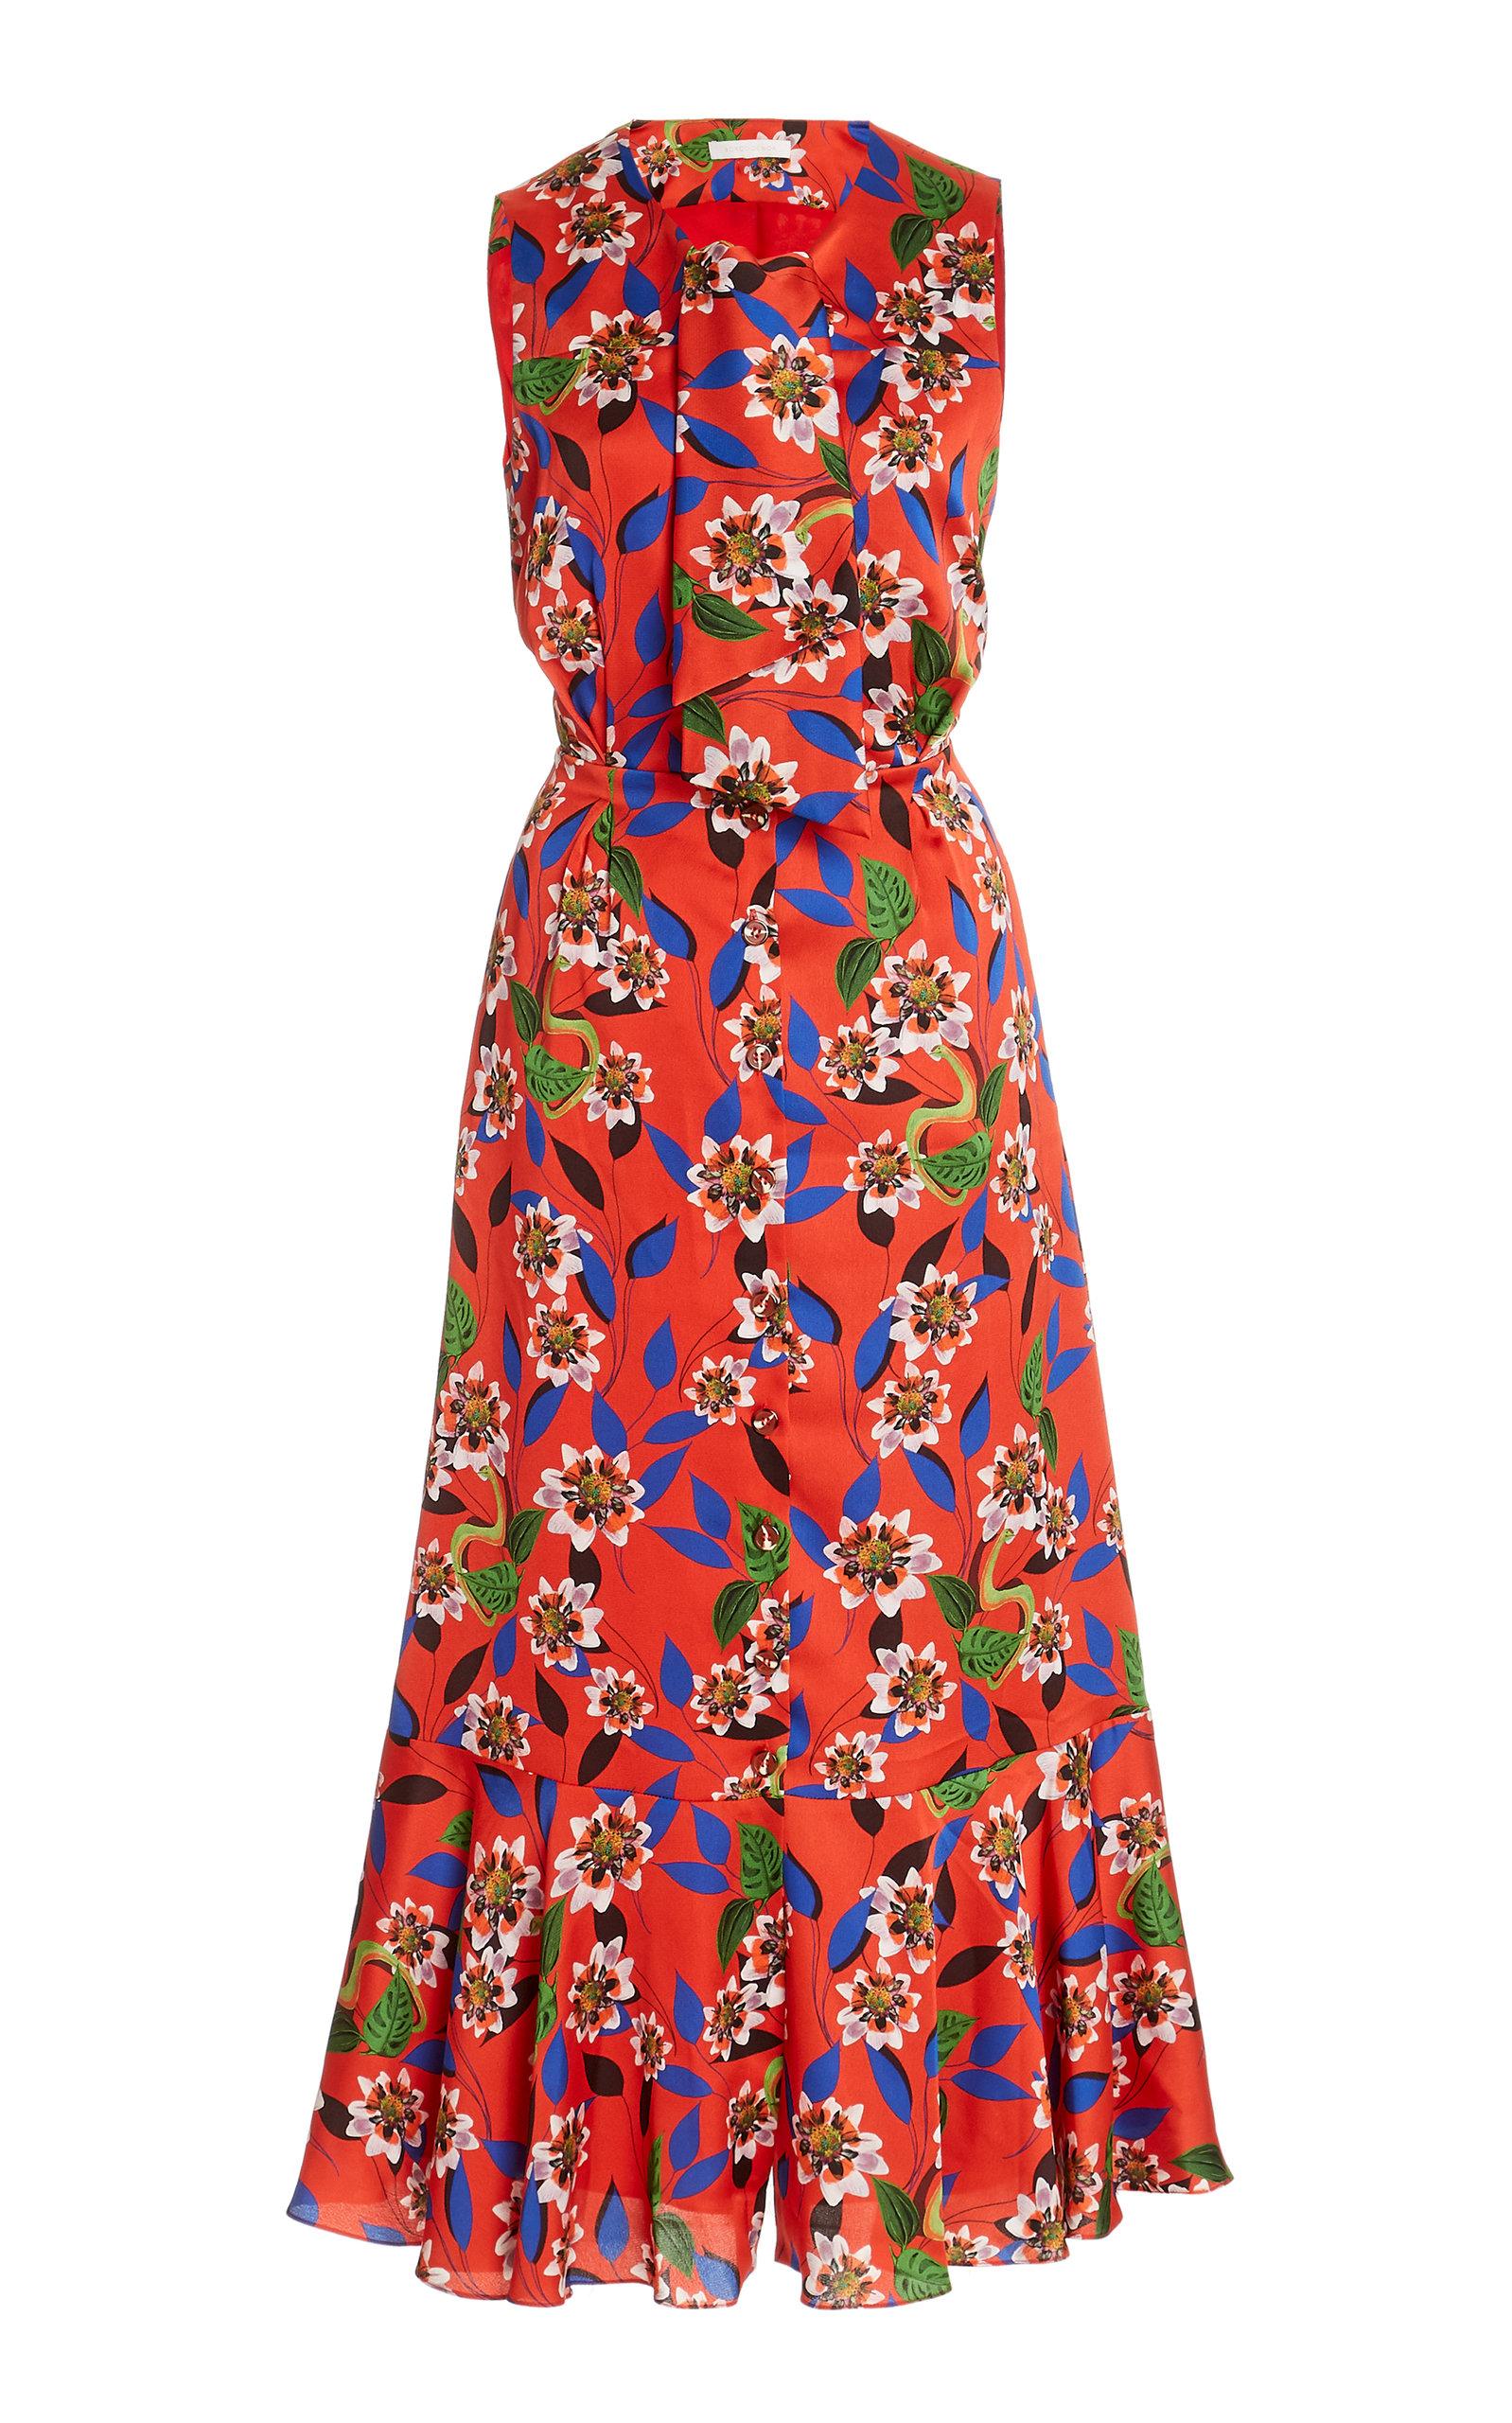 Buy Borgo De Nor Dreaming in Colour Floral-Print Crepe Dress online, shop Borgo De Nor at the best price